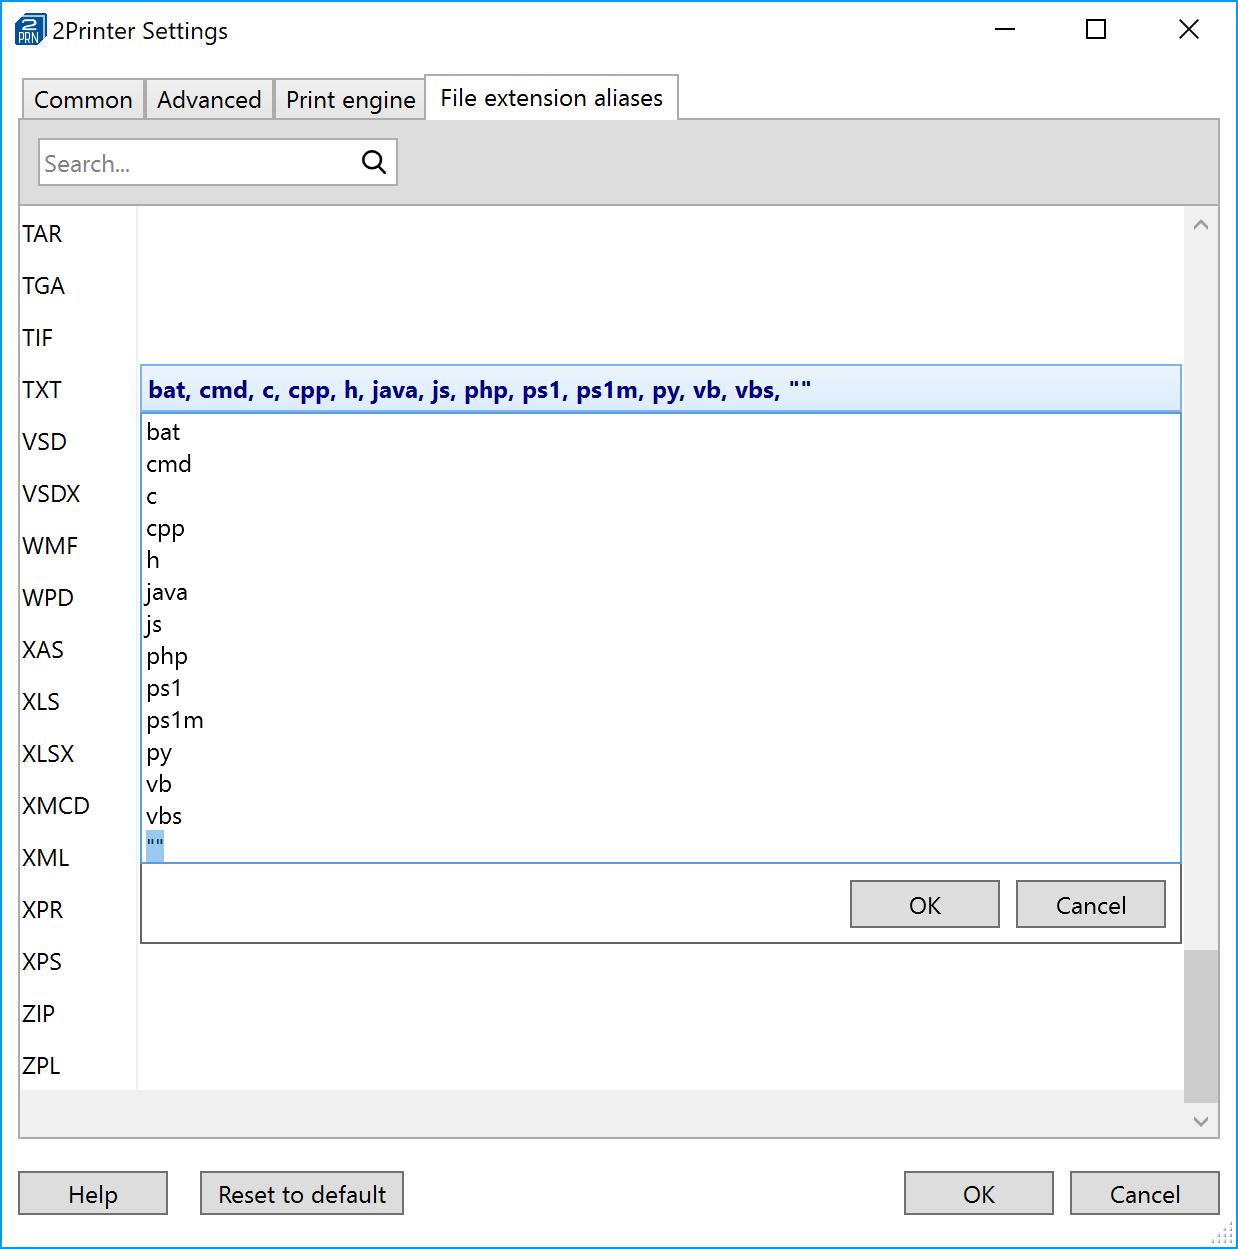 Set or change file associations in 2Printer